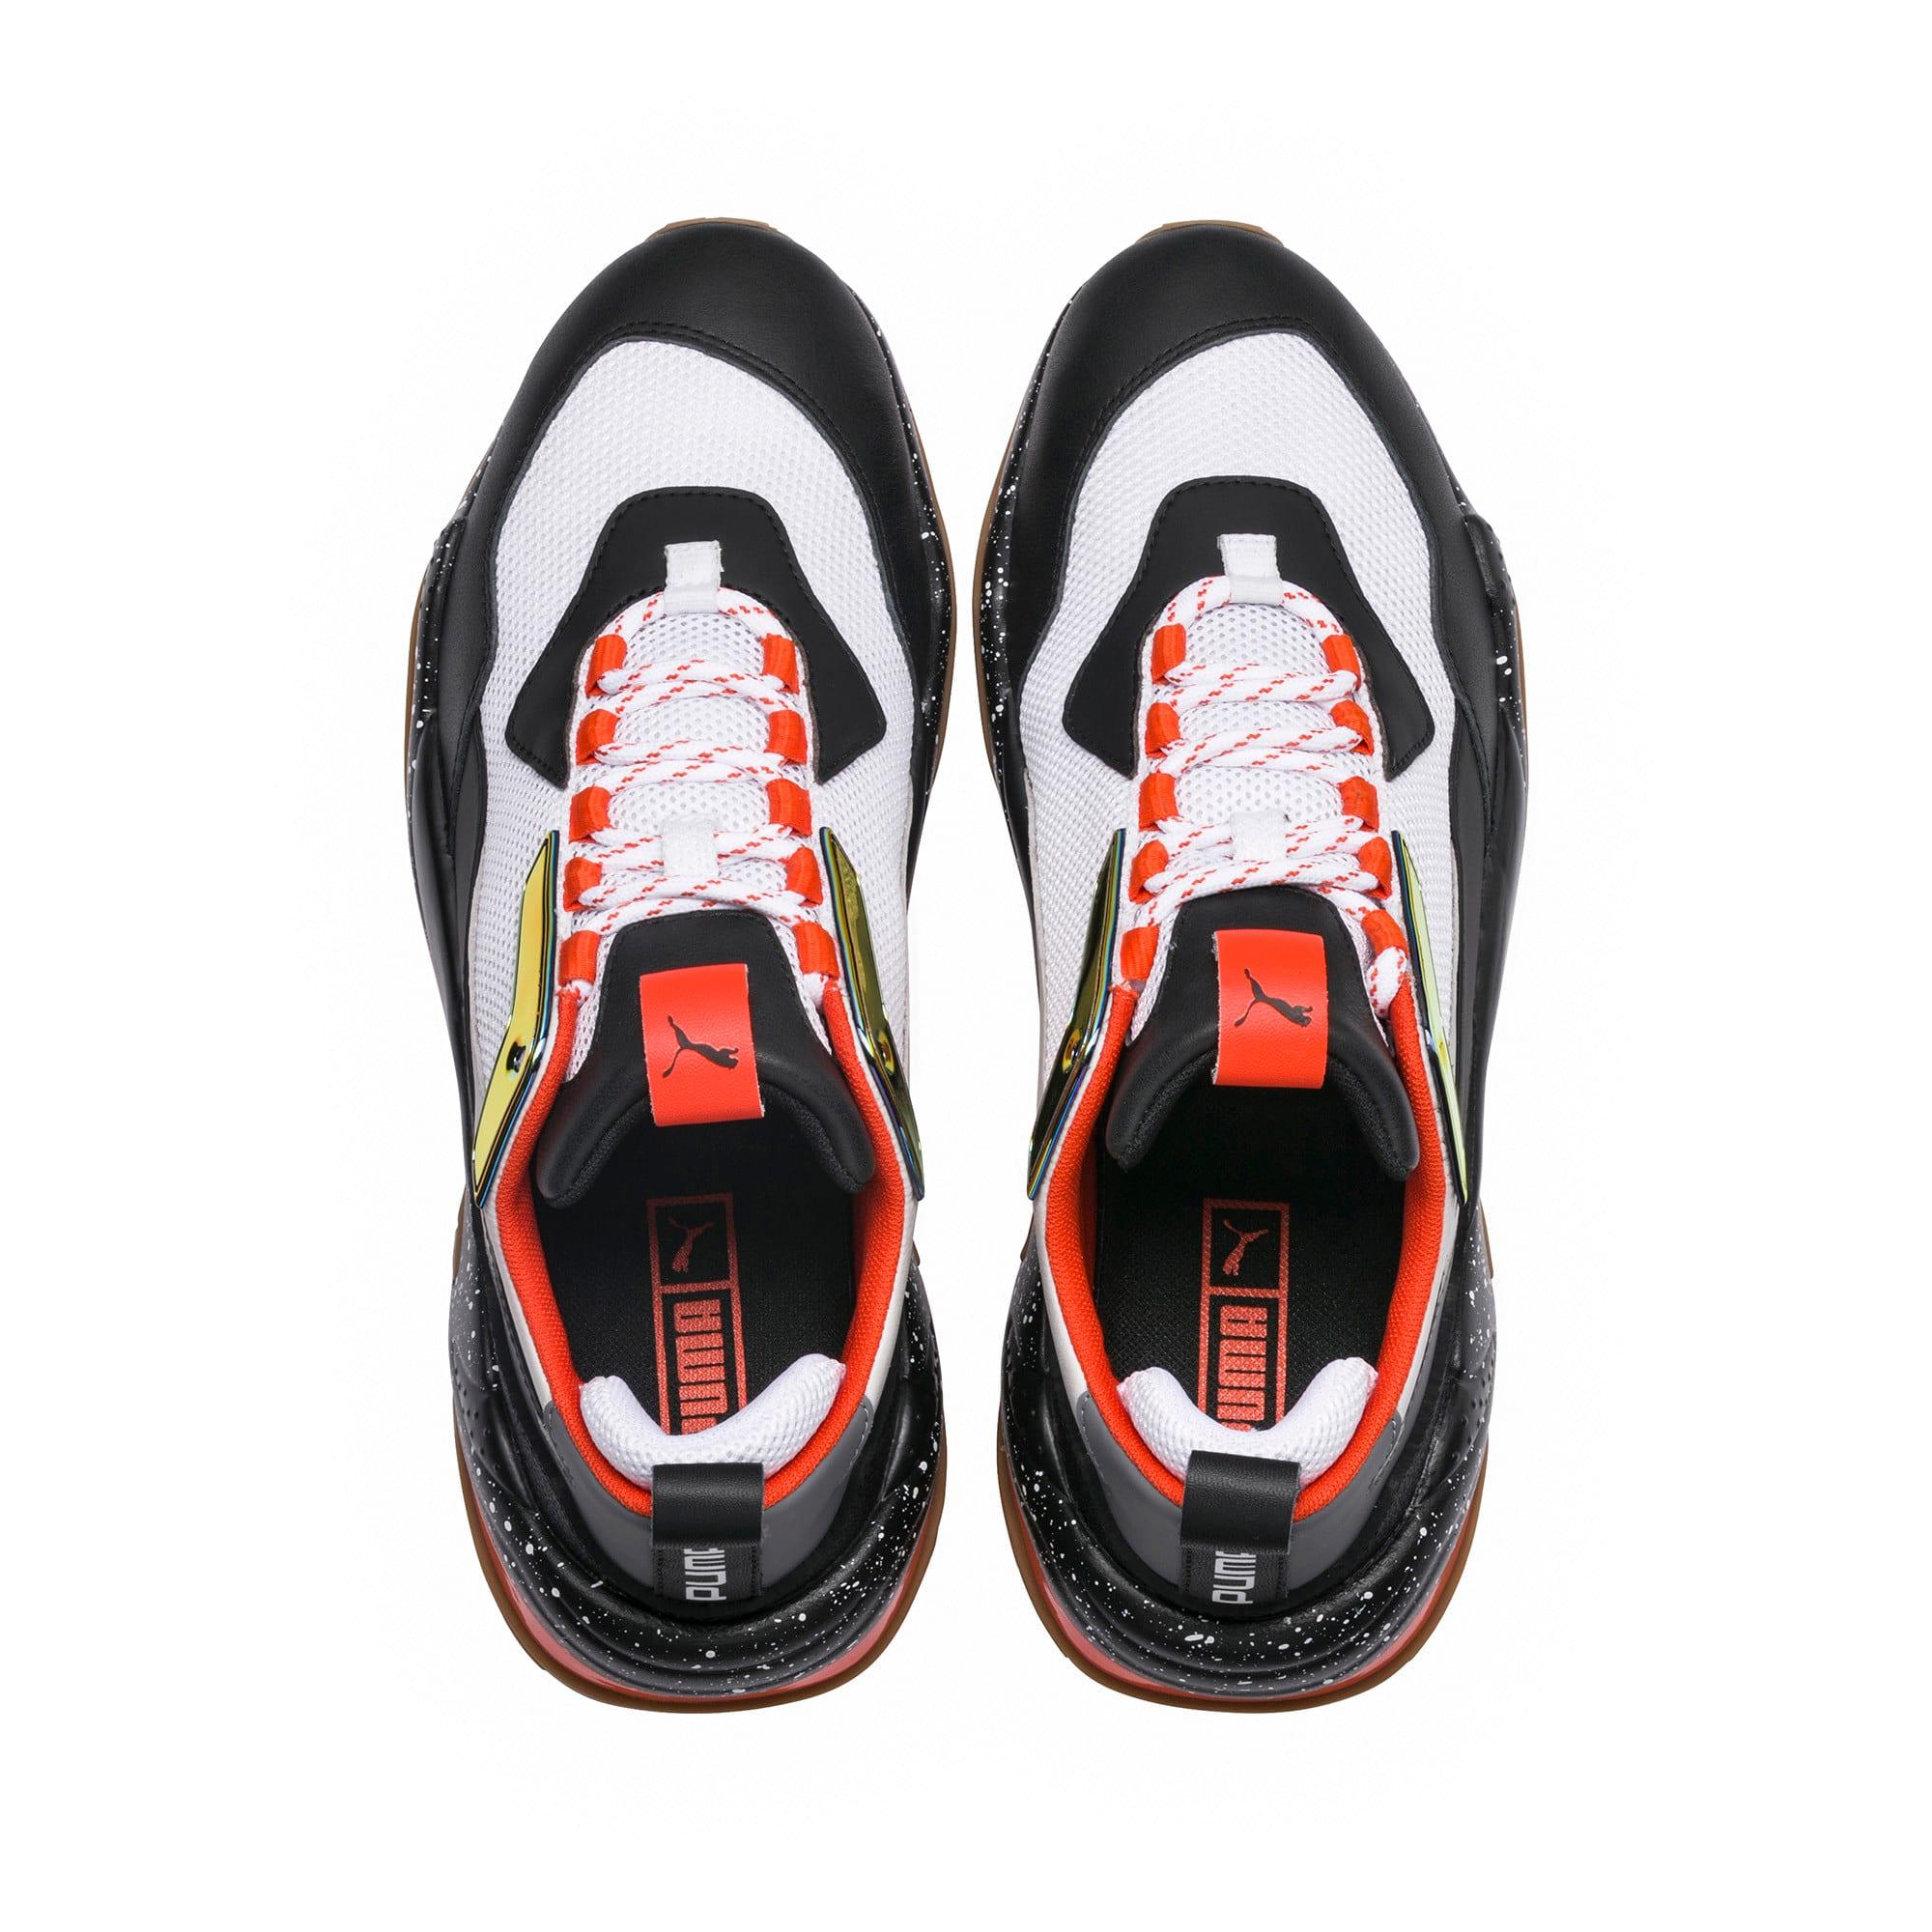 Thumbnail 6 of Thunder Electric Sneakers, White-Black-Mandarine Red, medium